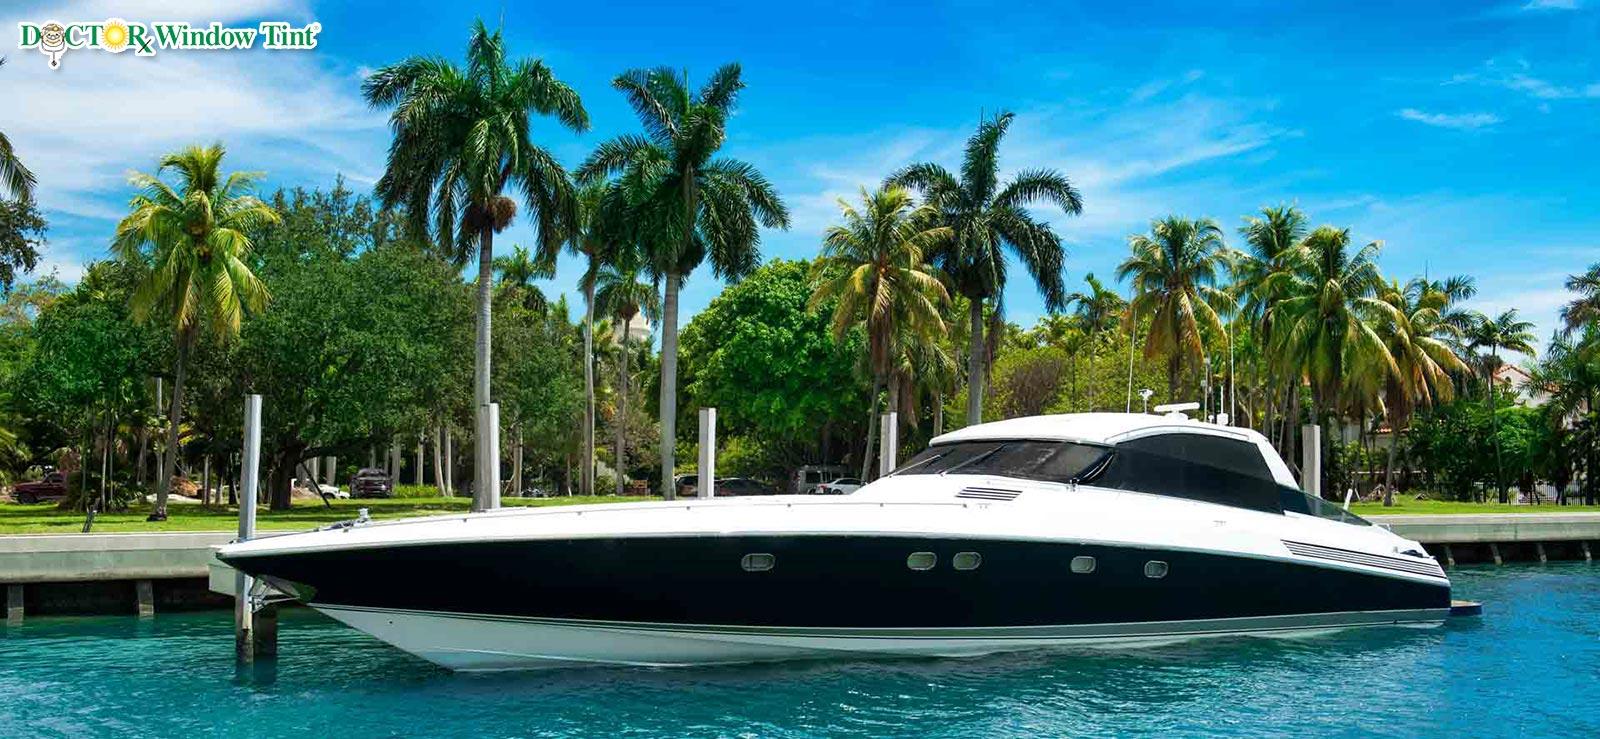 yacht tinting